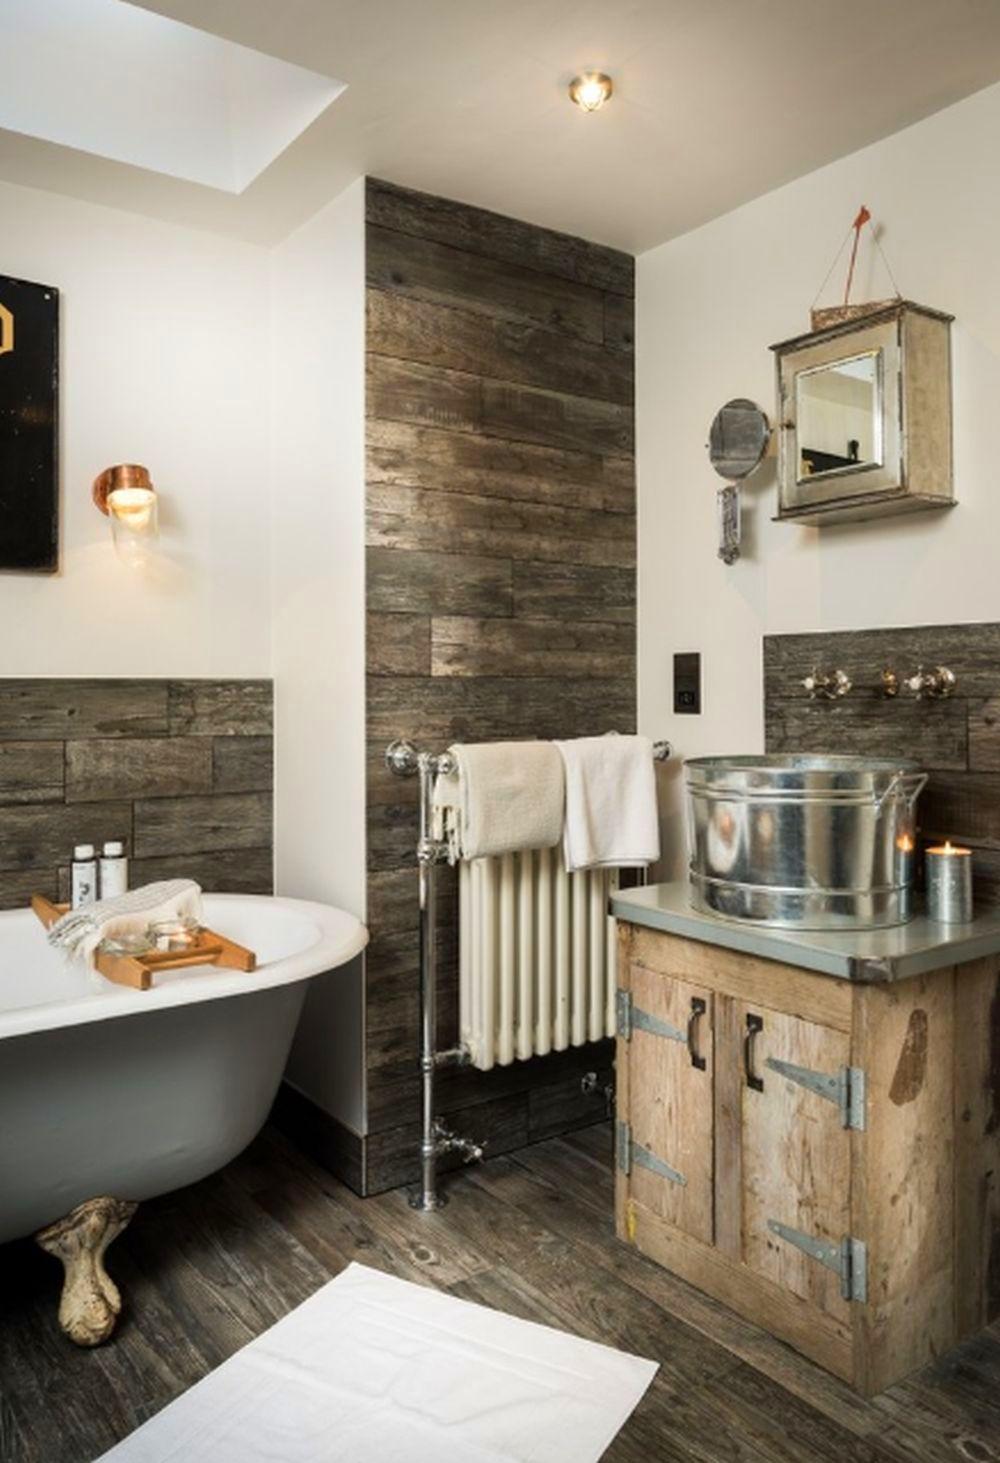 adelaparvu.com despre casa cu acoperis din stuf, casa UK, The Fable, Foto Unique Home Stays (6)